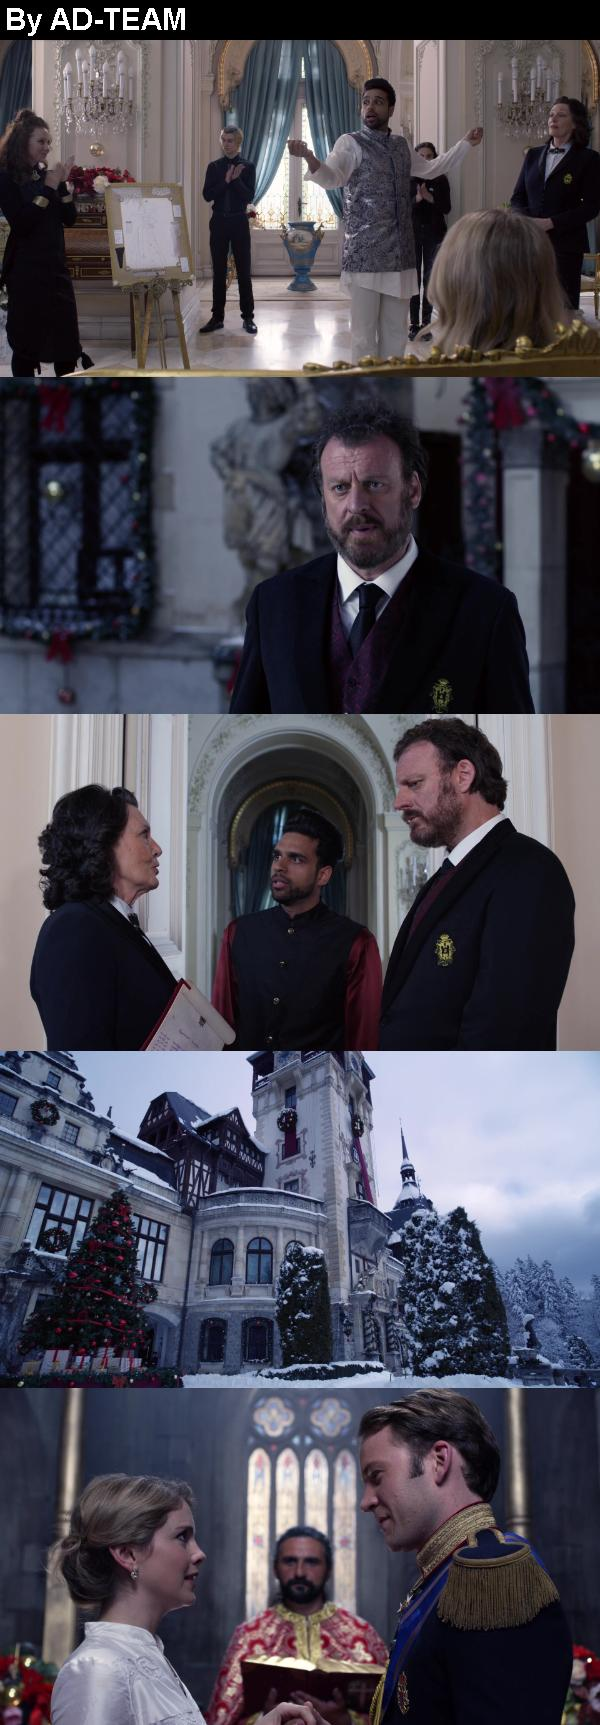 130781067_a-christmas-prince-the-royal-wedding-2018-1080p-webrip-x264-rarbg.jpg